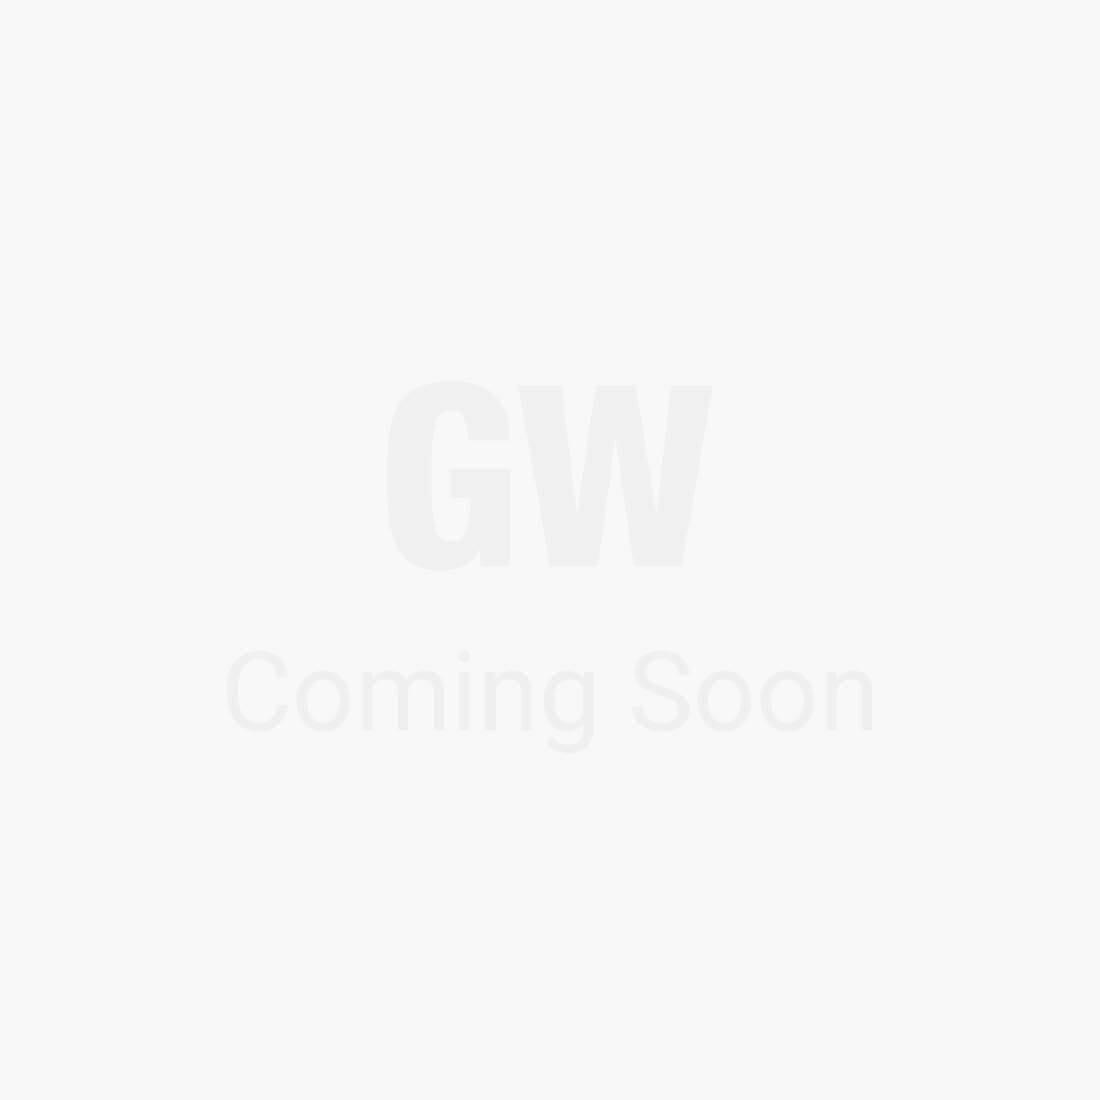 Sonoma Slat Day Bed